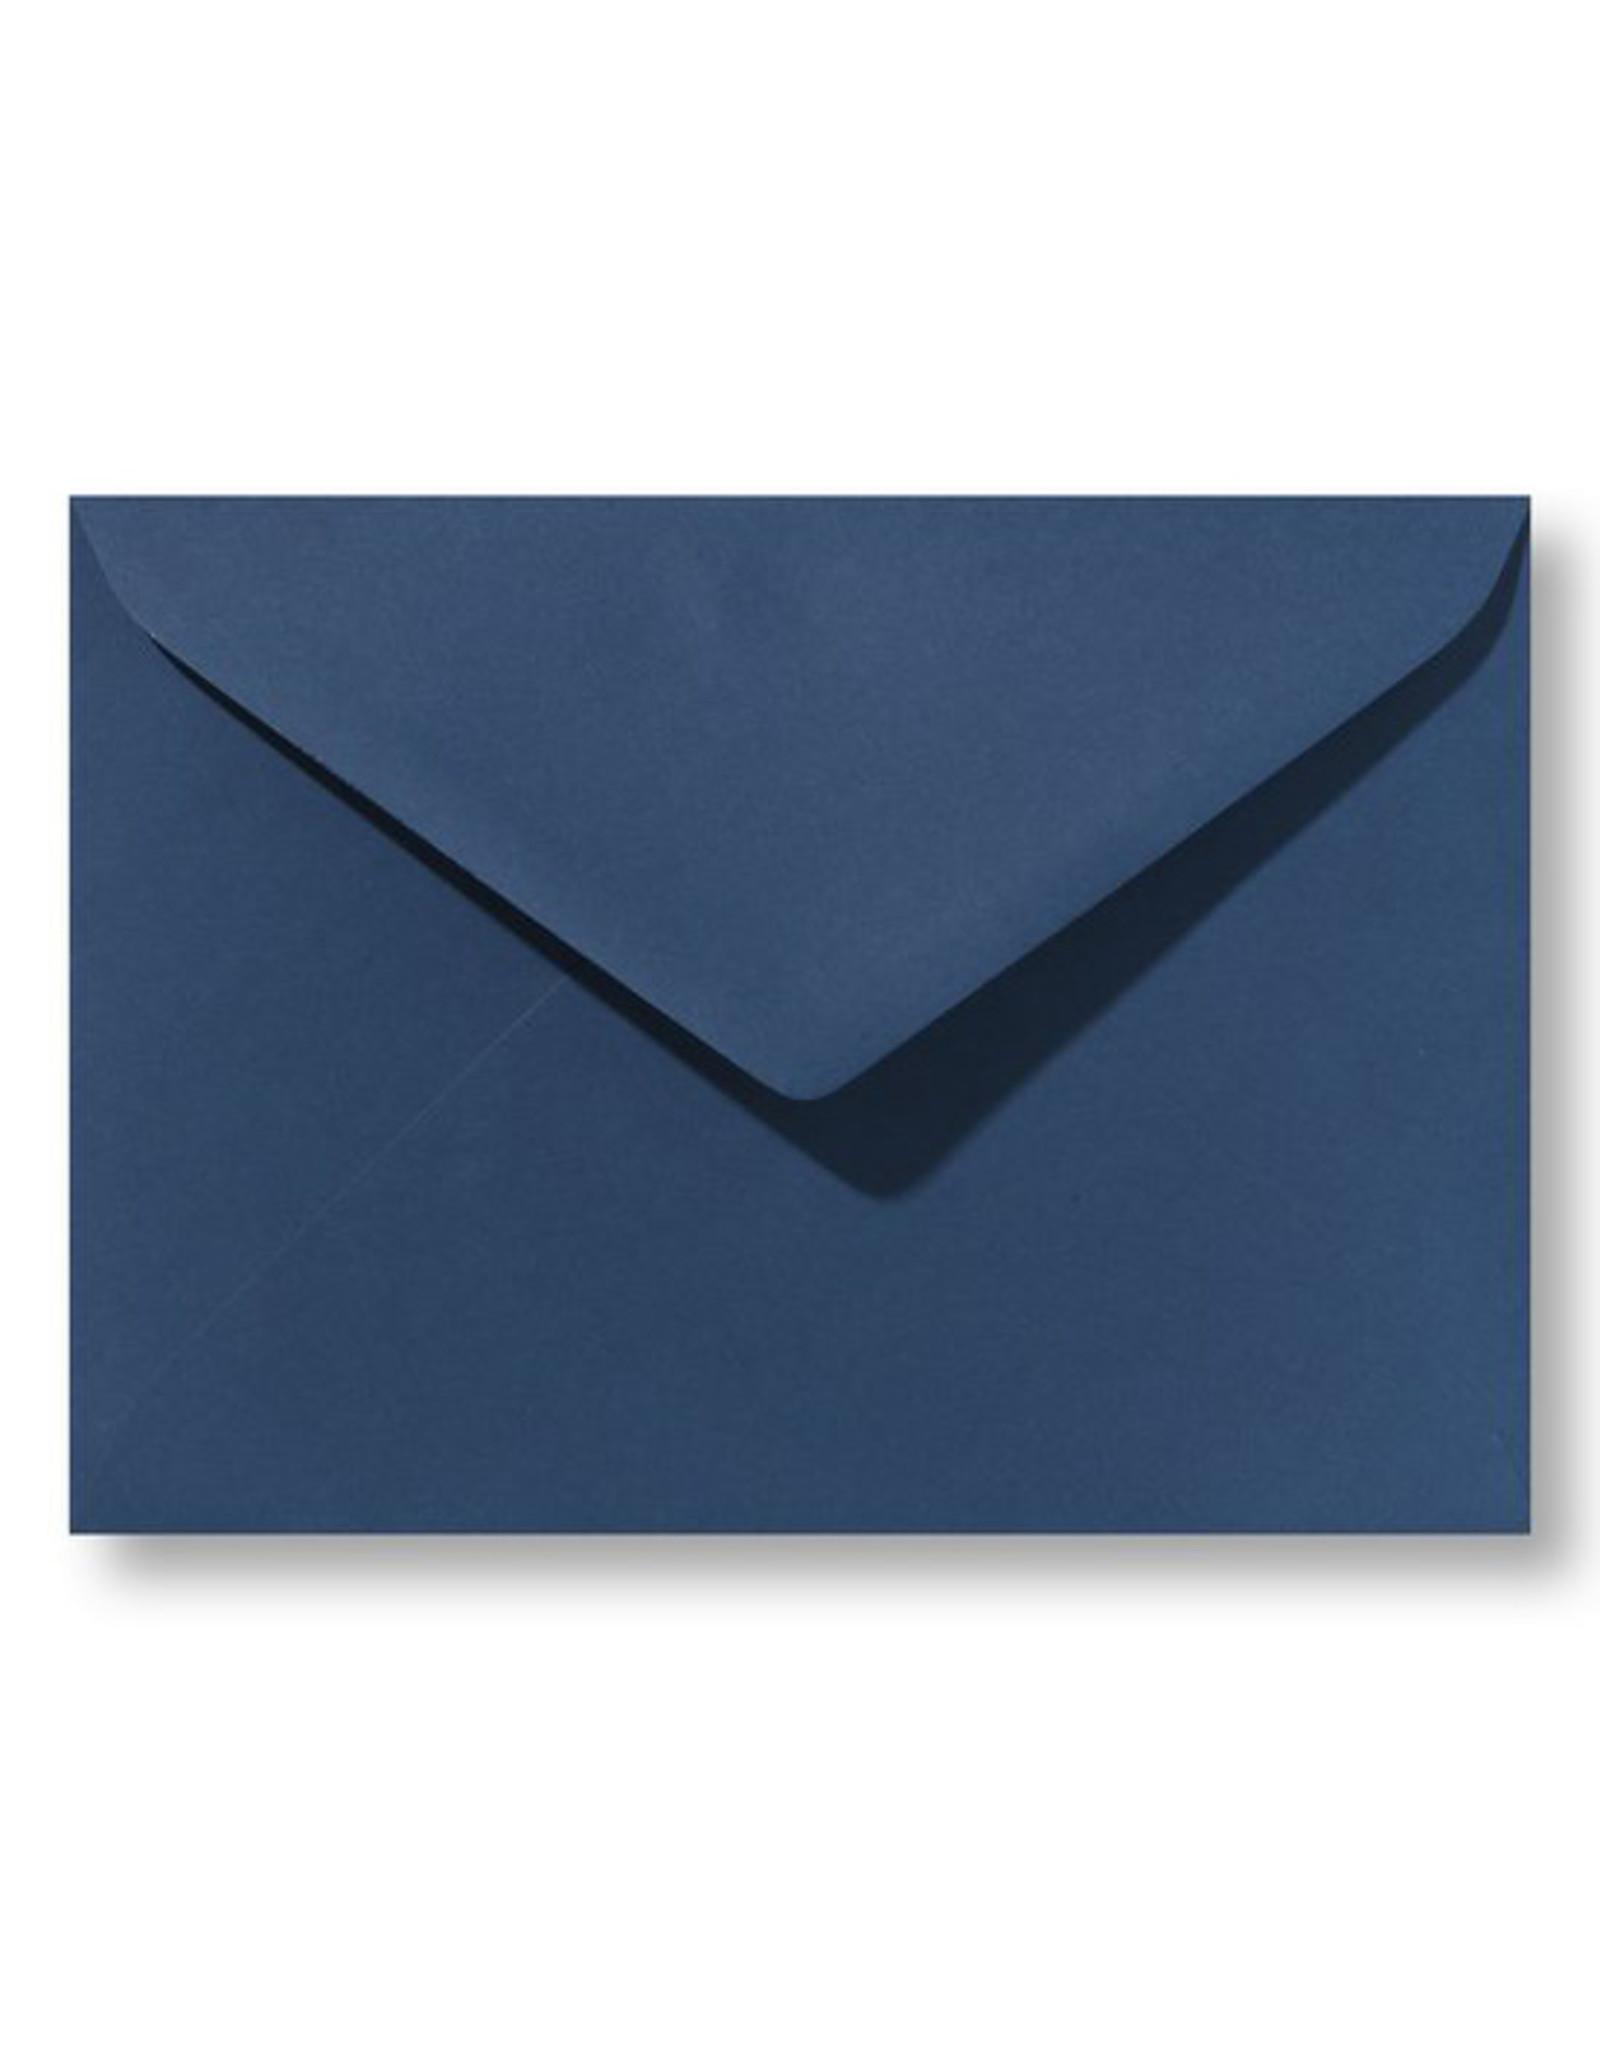 www.Robin.cards Blanco effen envelop Donkerblauw